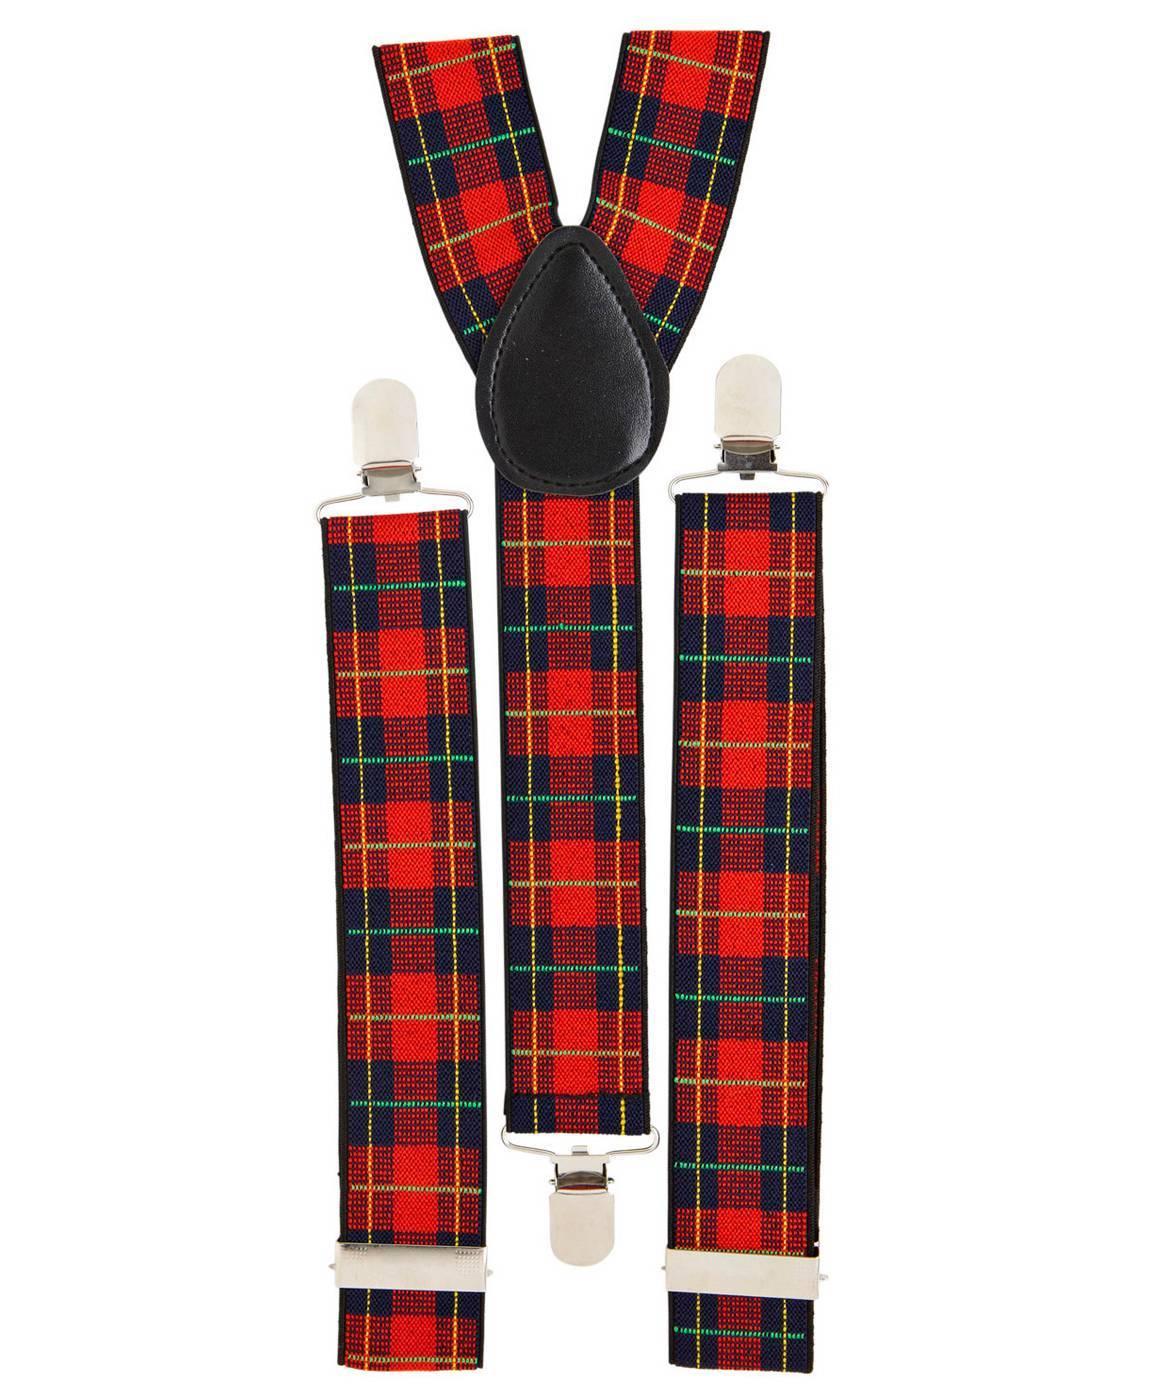 Bretelles-écossaises